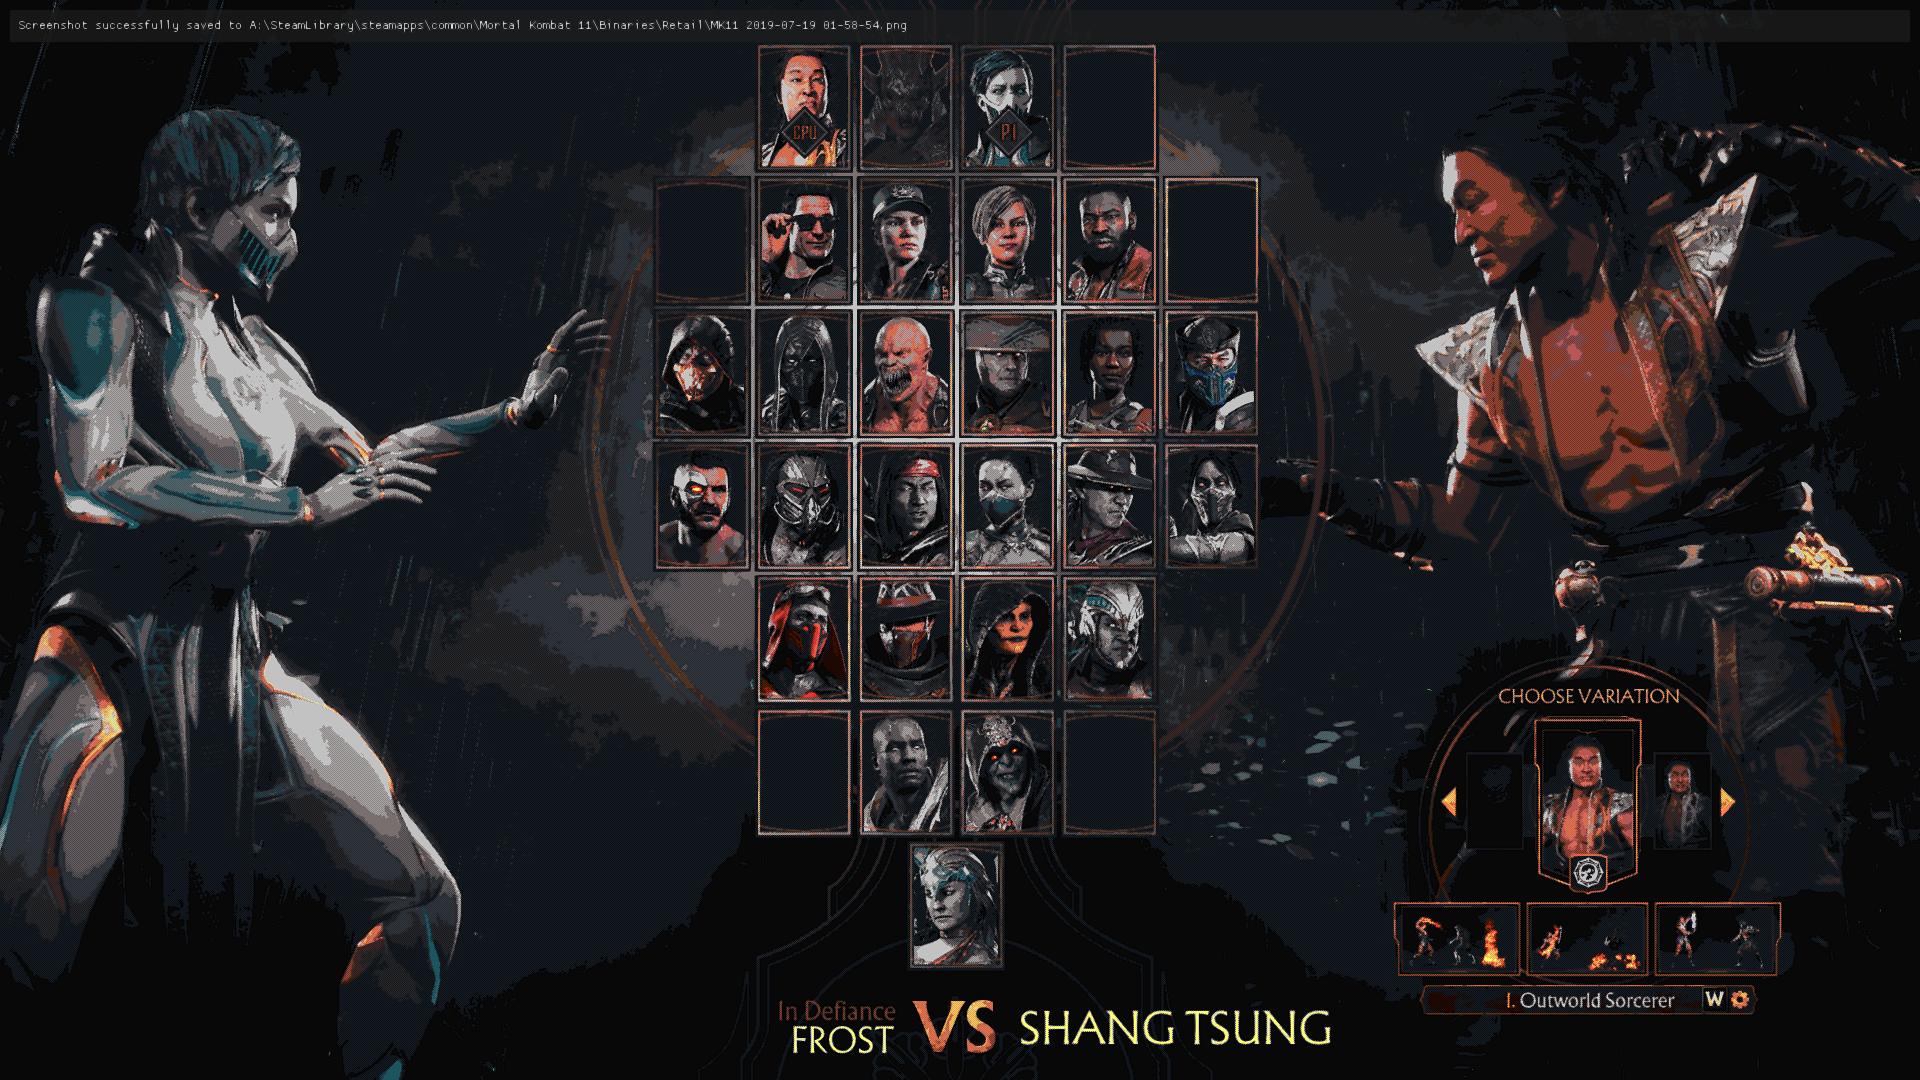 Mortal Kombat 11 Retro Mod Turns It Into a Classic 2D Fighter